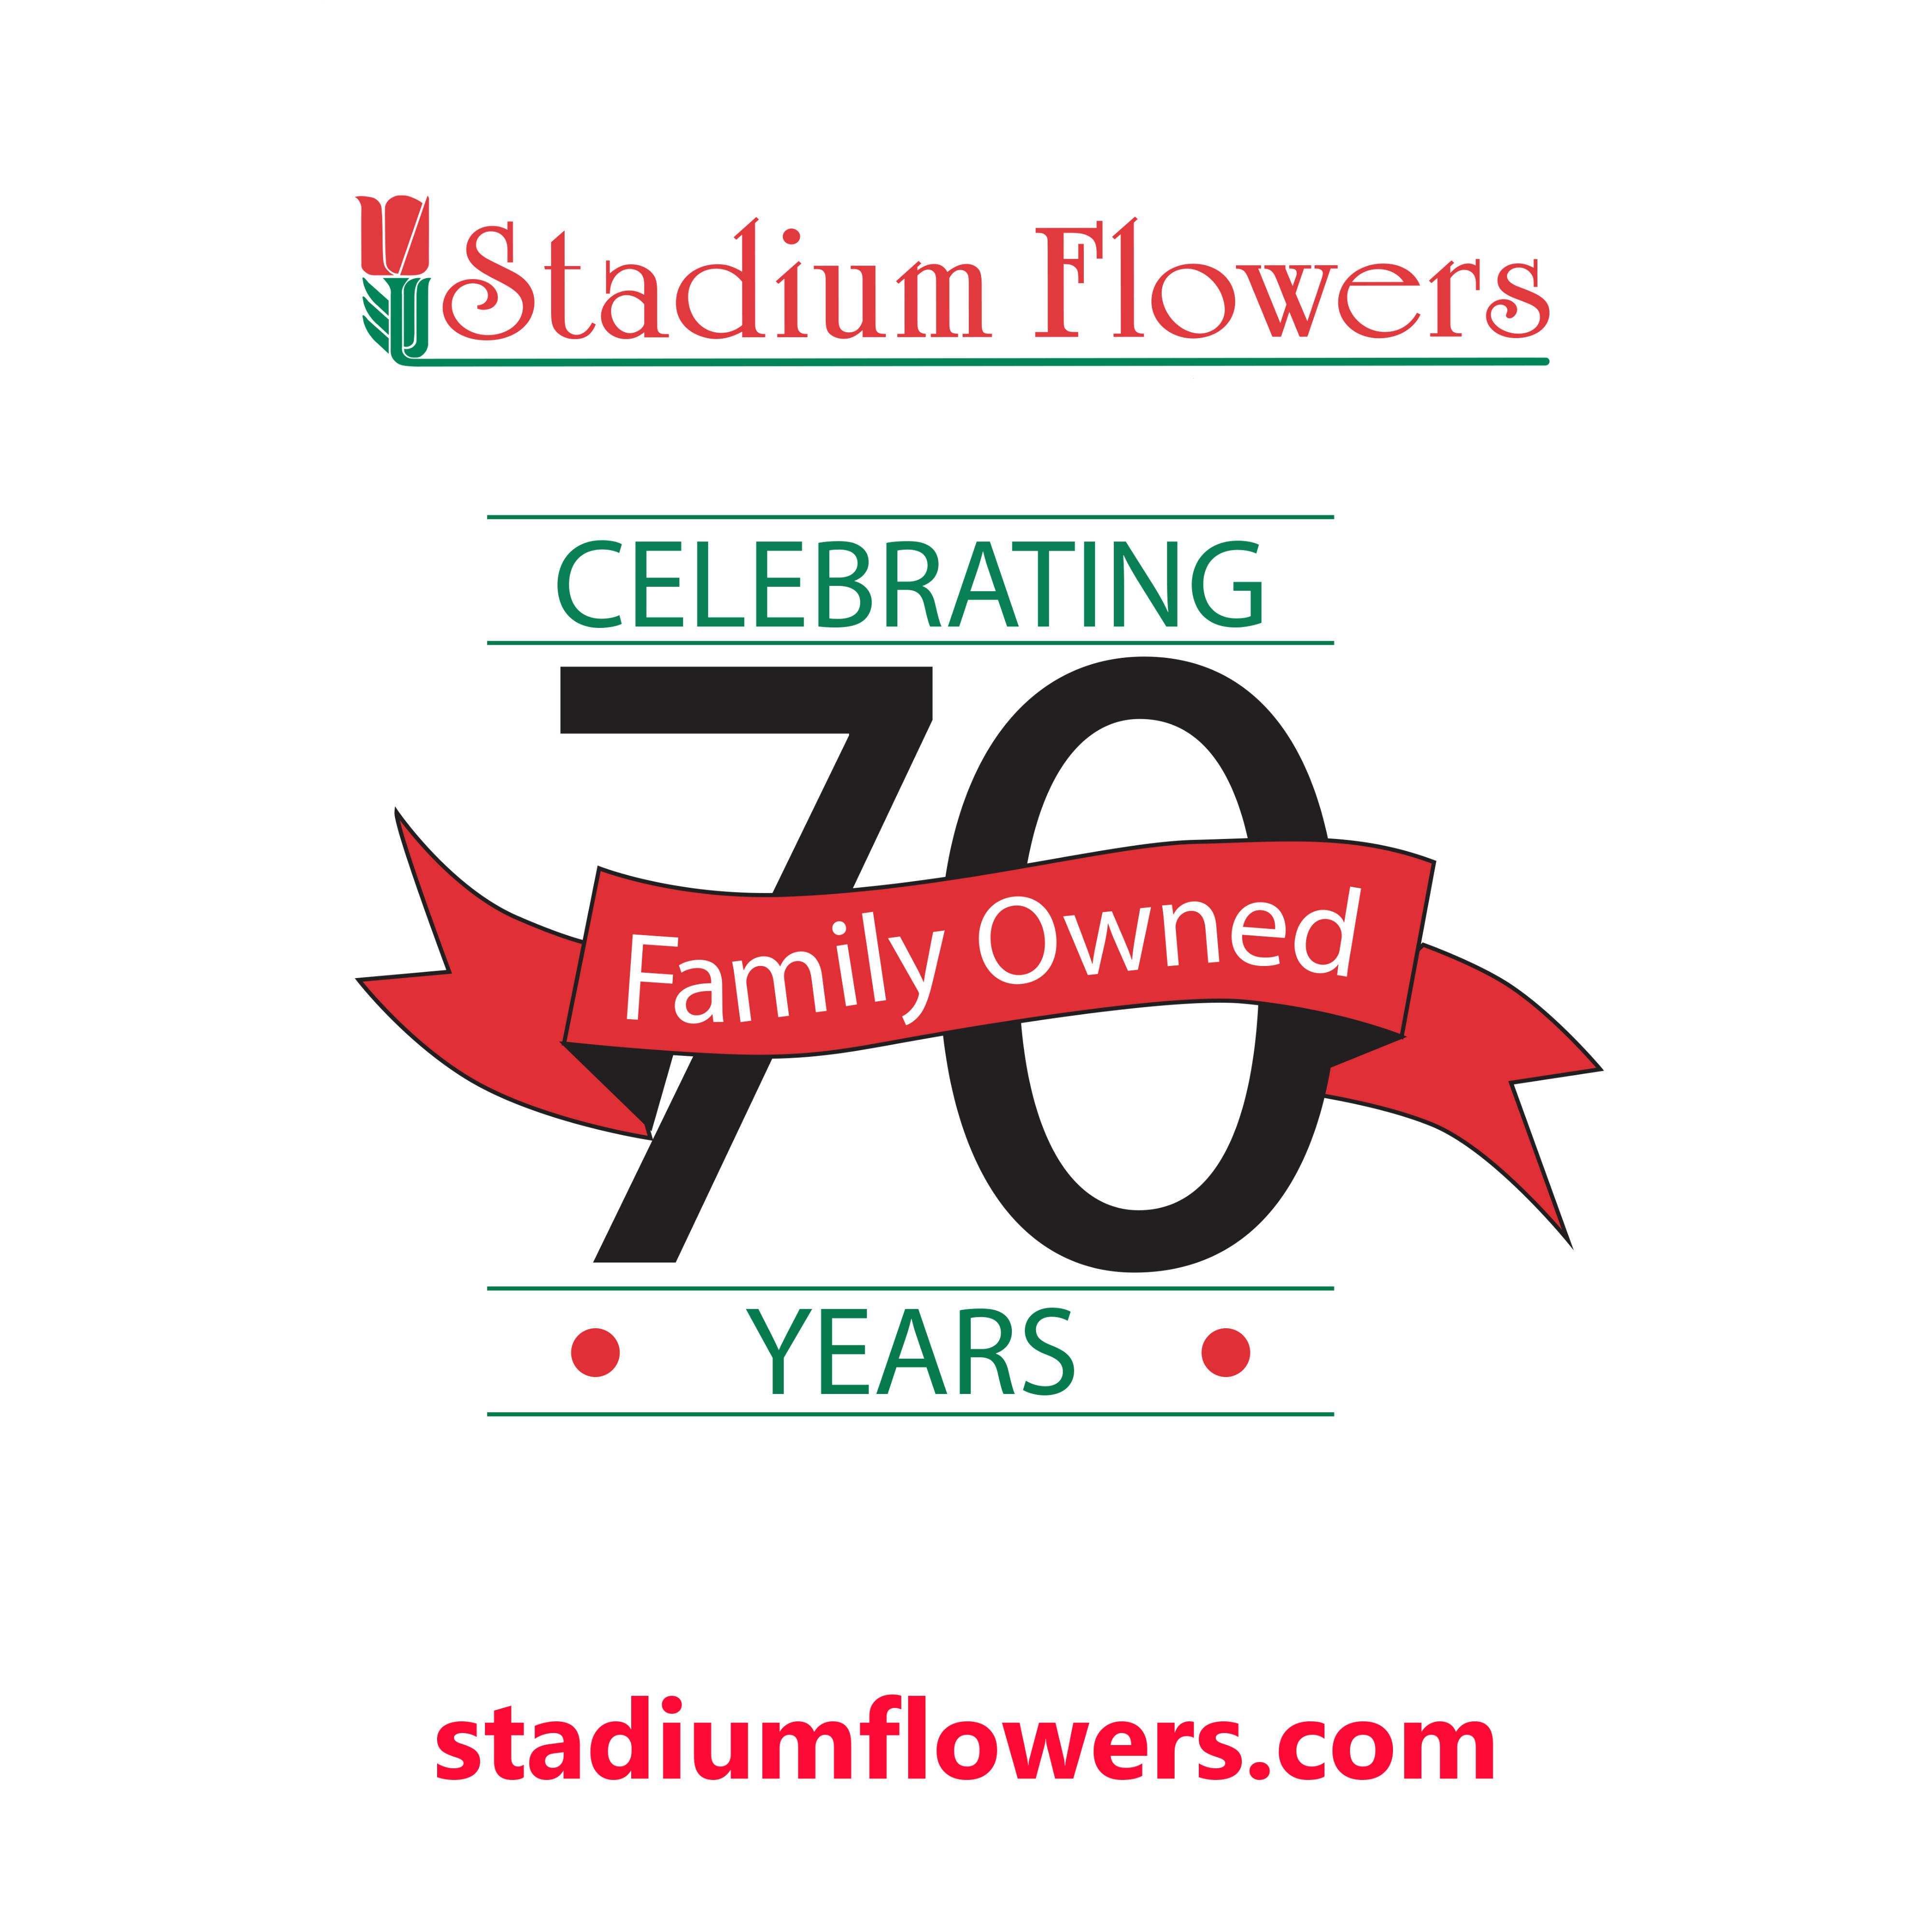 Stadium Flowers image 12